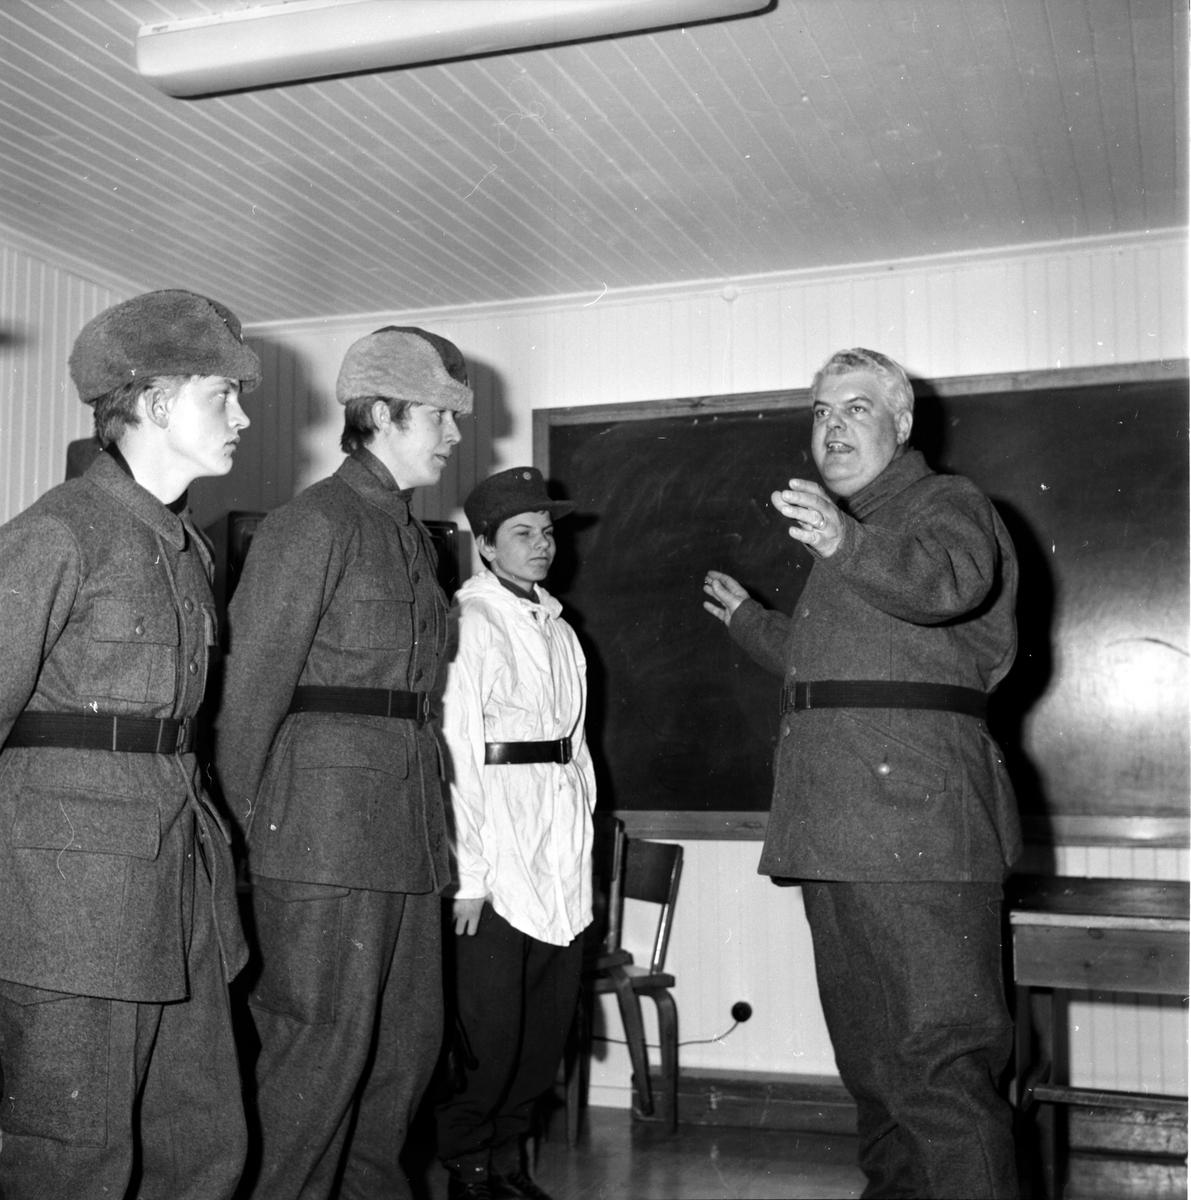 Stagården, Nygården, Ankarcrona, Westerlund, 17 Februari 1967